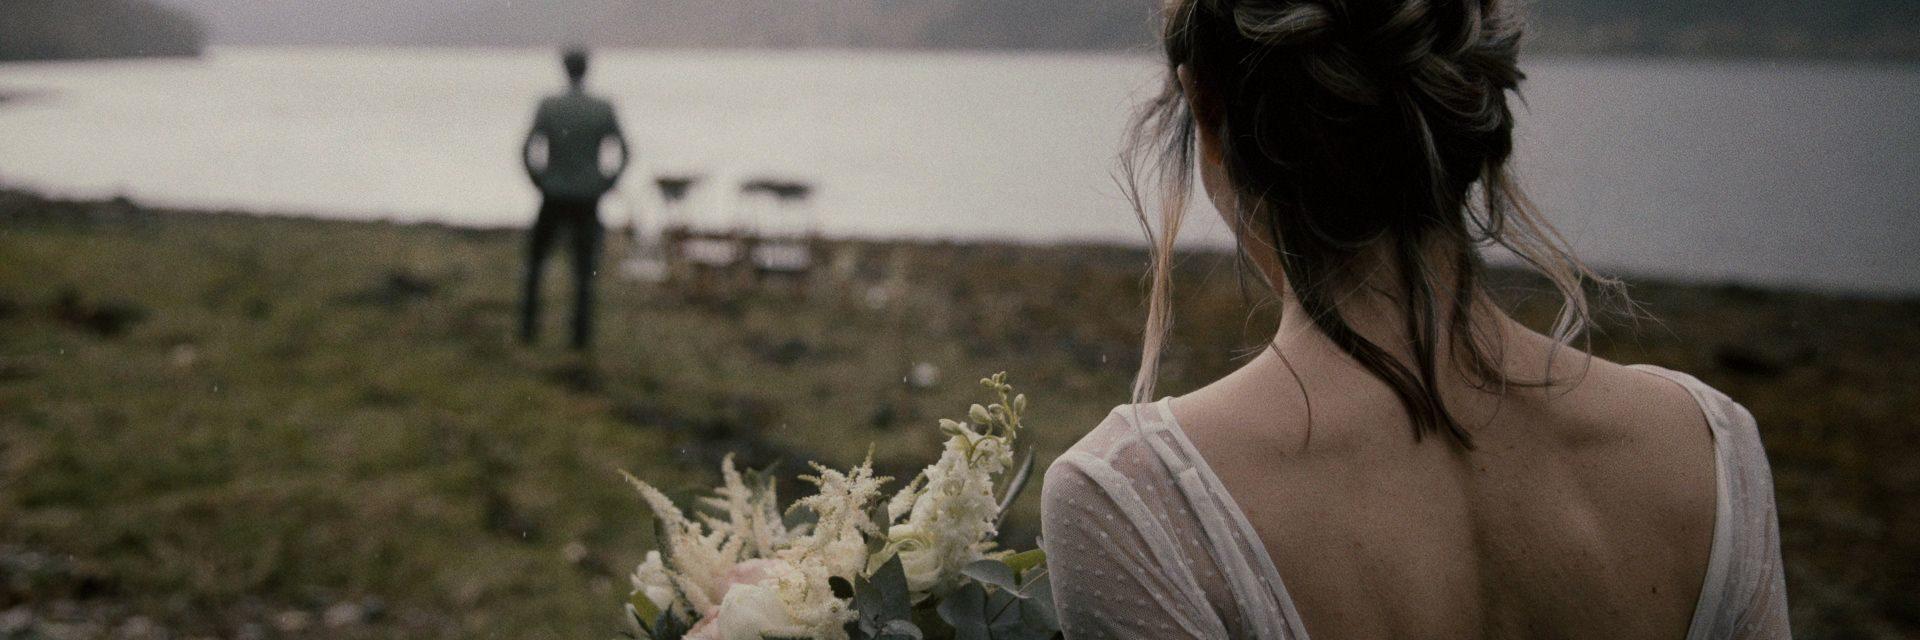 Seychelles-wedding-videographer-cinemate-films-02